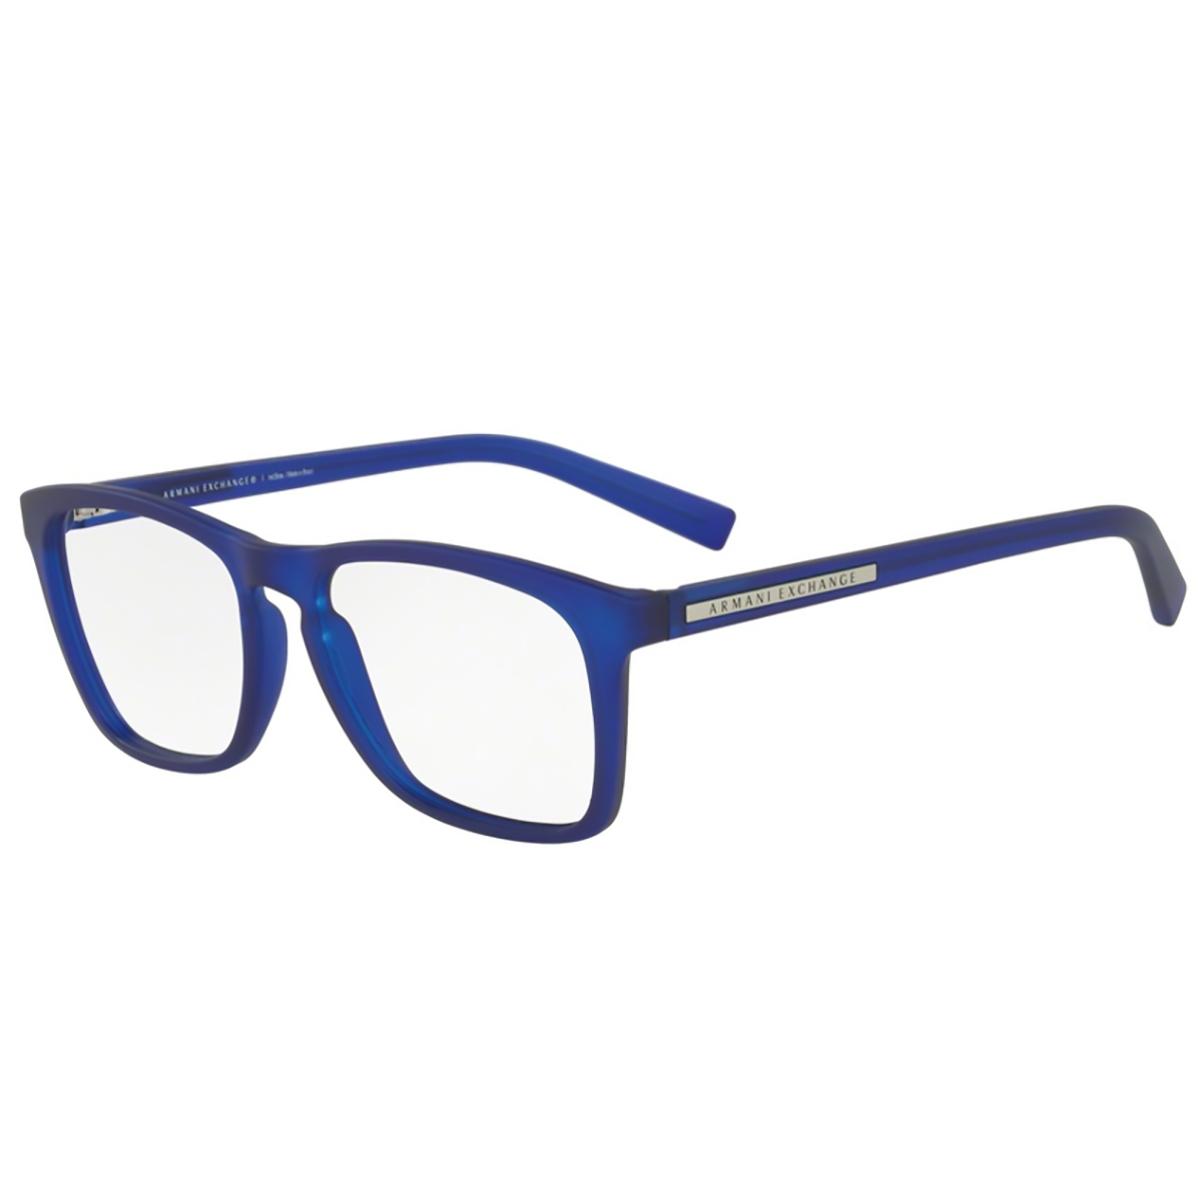 40a3b3009a7cd óculos Shop. Compre Óculos de Grau Armani Exchange em 10X   Tri-Jóia Shop